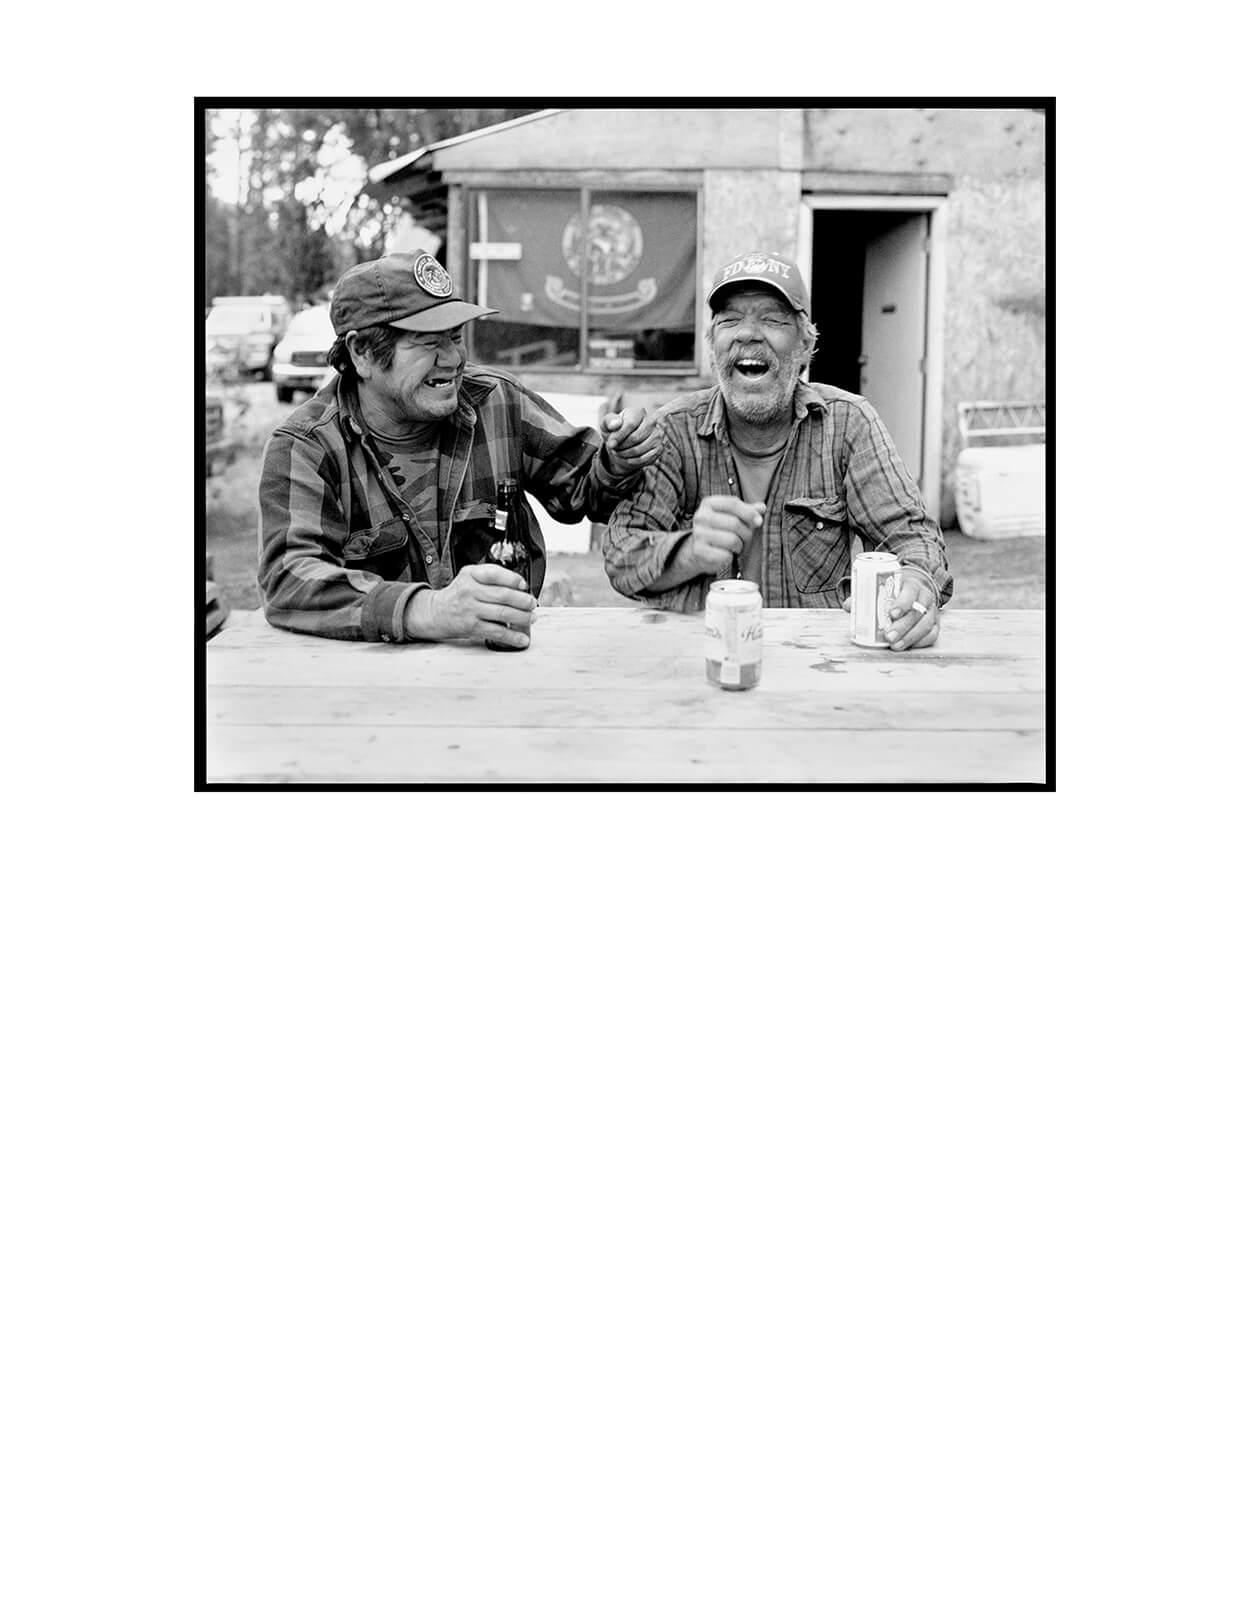 Hunter Barnes documents America's fringe communities in Roadbook - Popular Photography - Popular Photography - Page 10